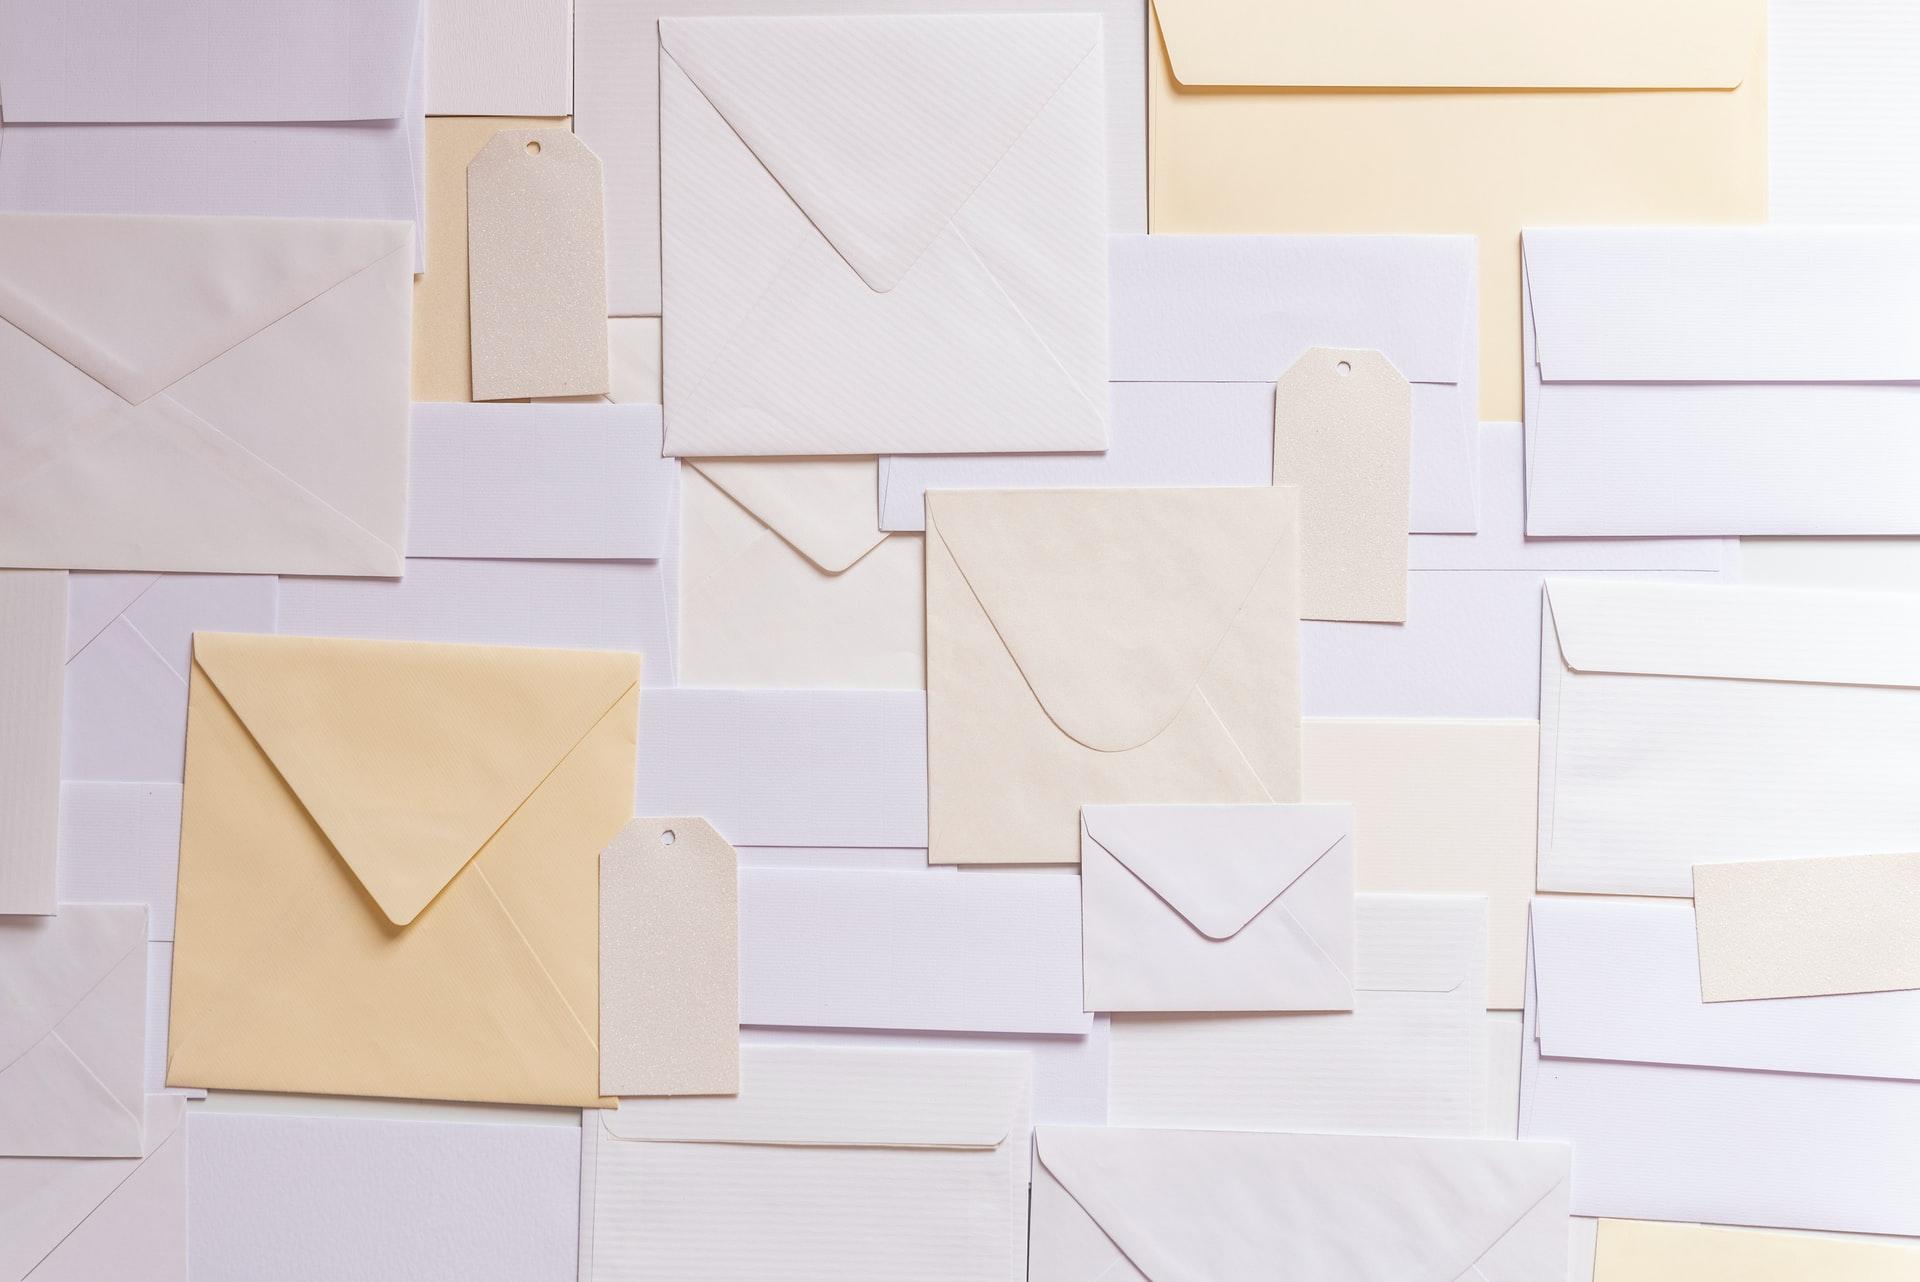 MW WP Formの添付ファイルで送信できるファイルの種類を制限する方法